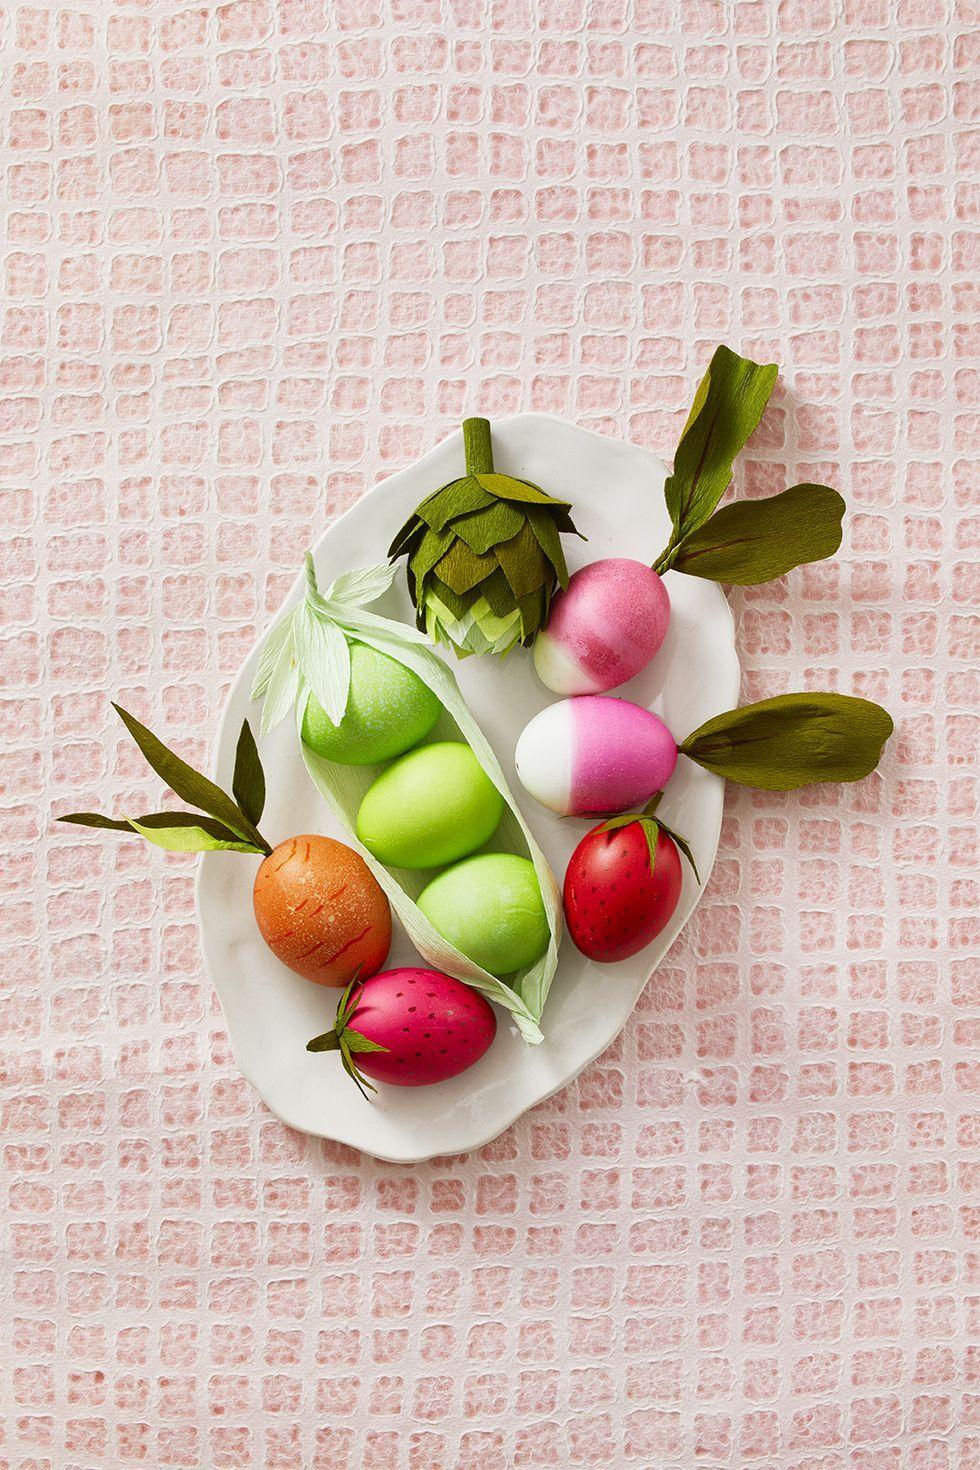 60 Best Easter Egg Designs Easy Diy Ideas For Easter Egg Decorating